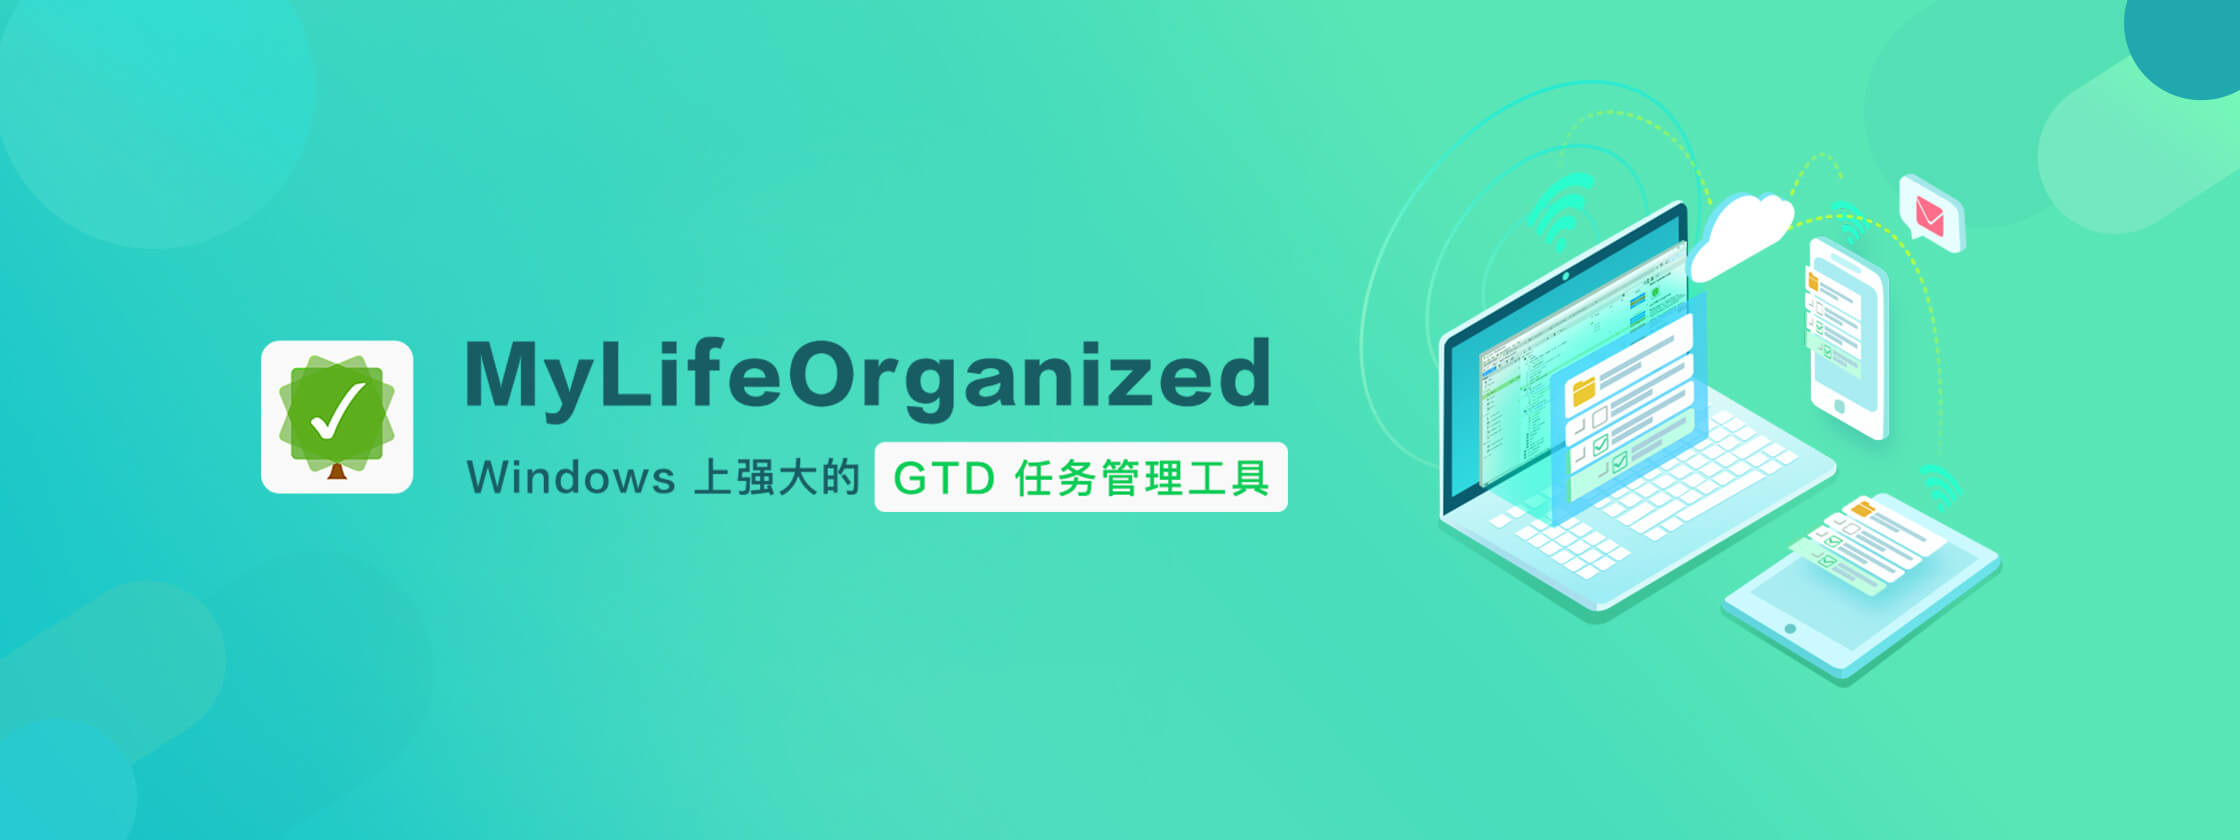 MyLifeOrganized:强大的 GTD 任务管理工具